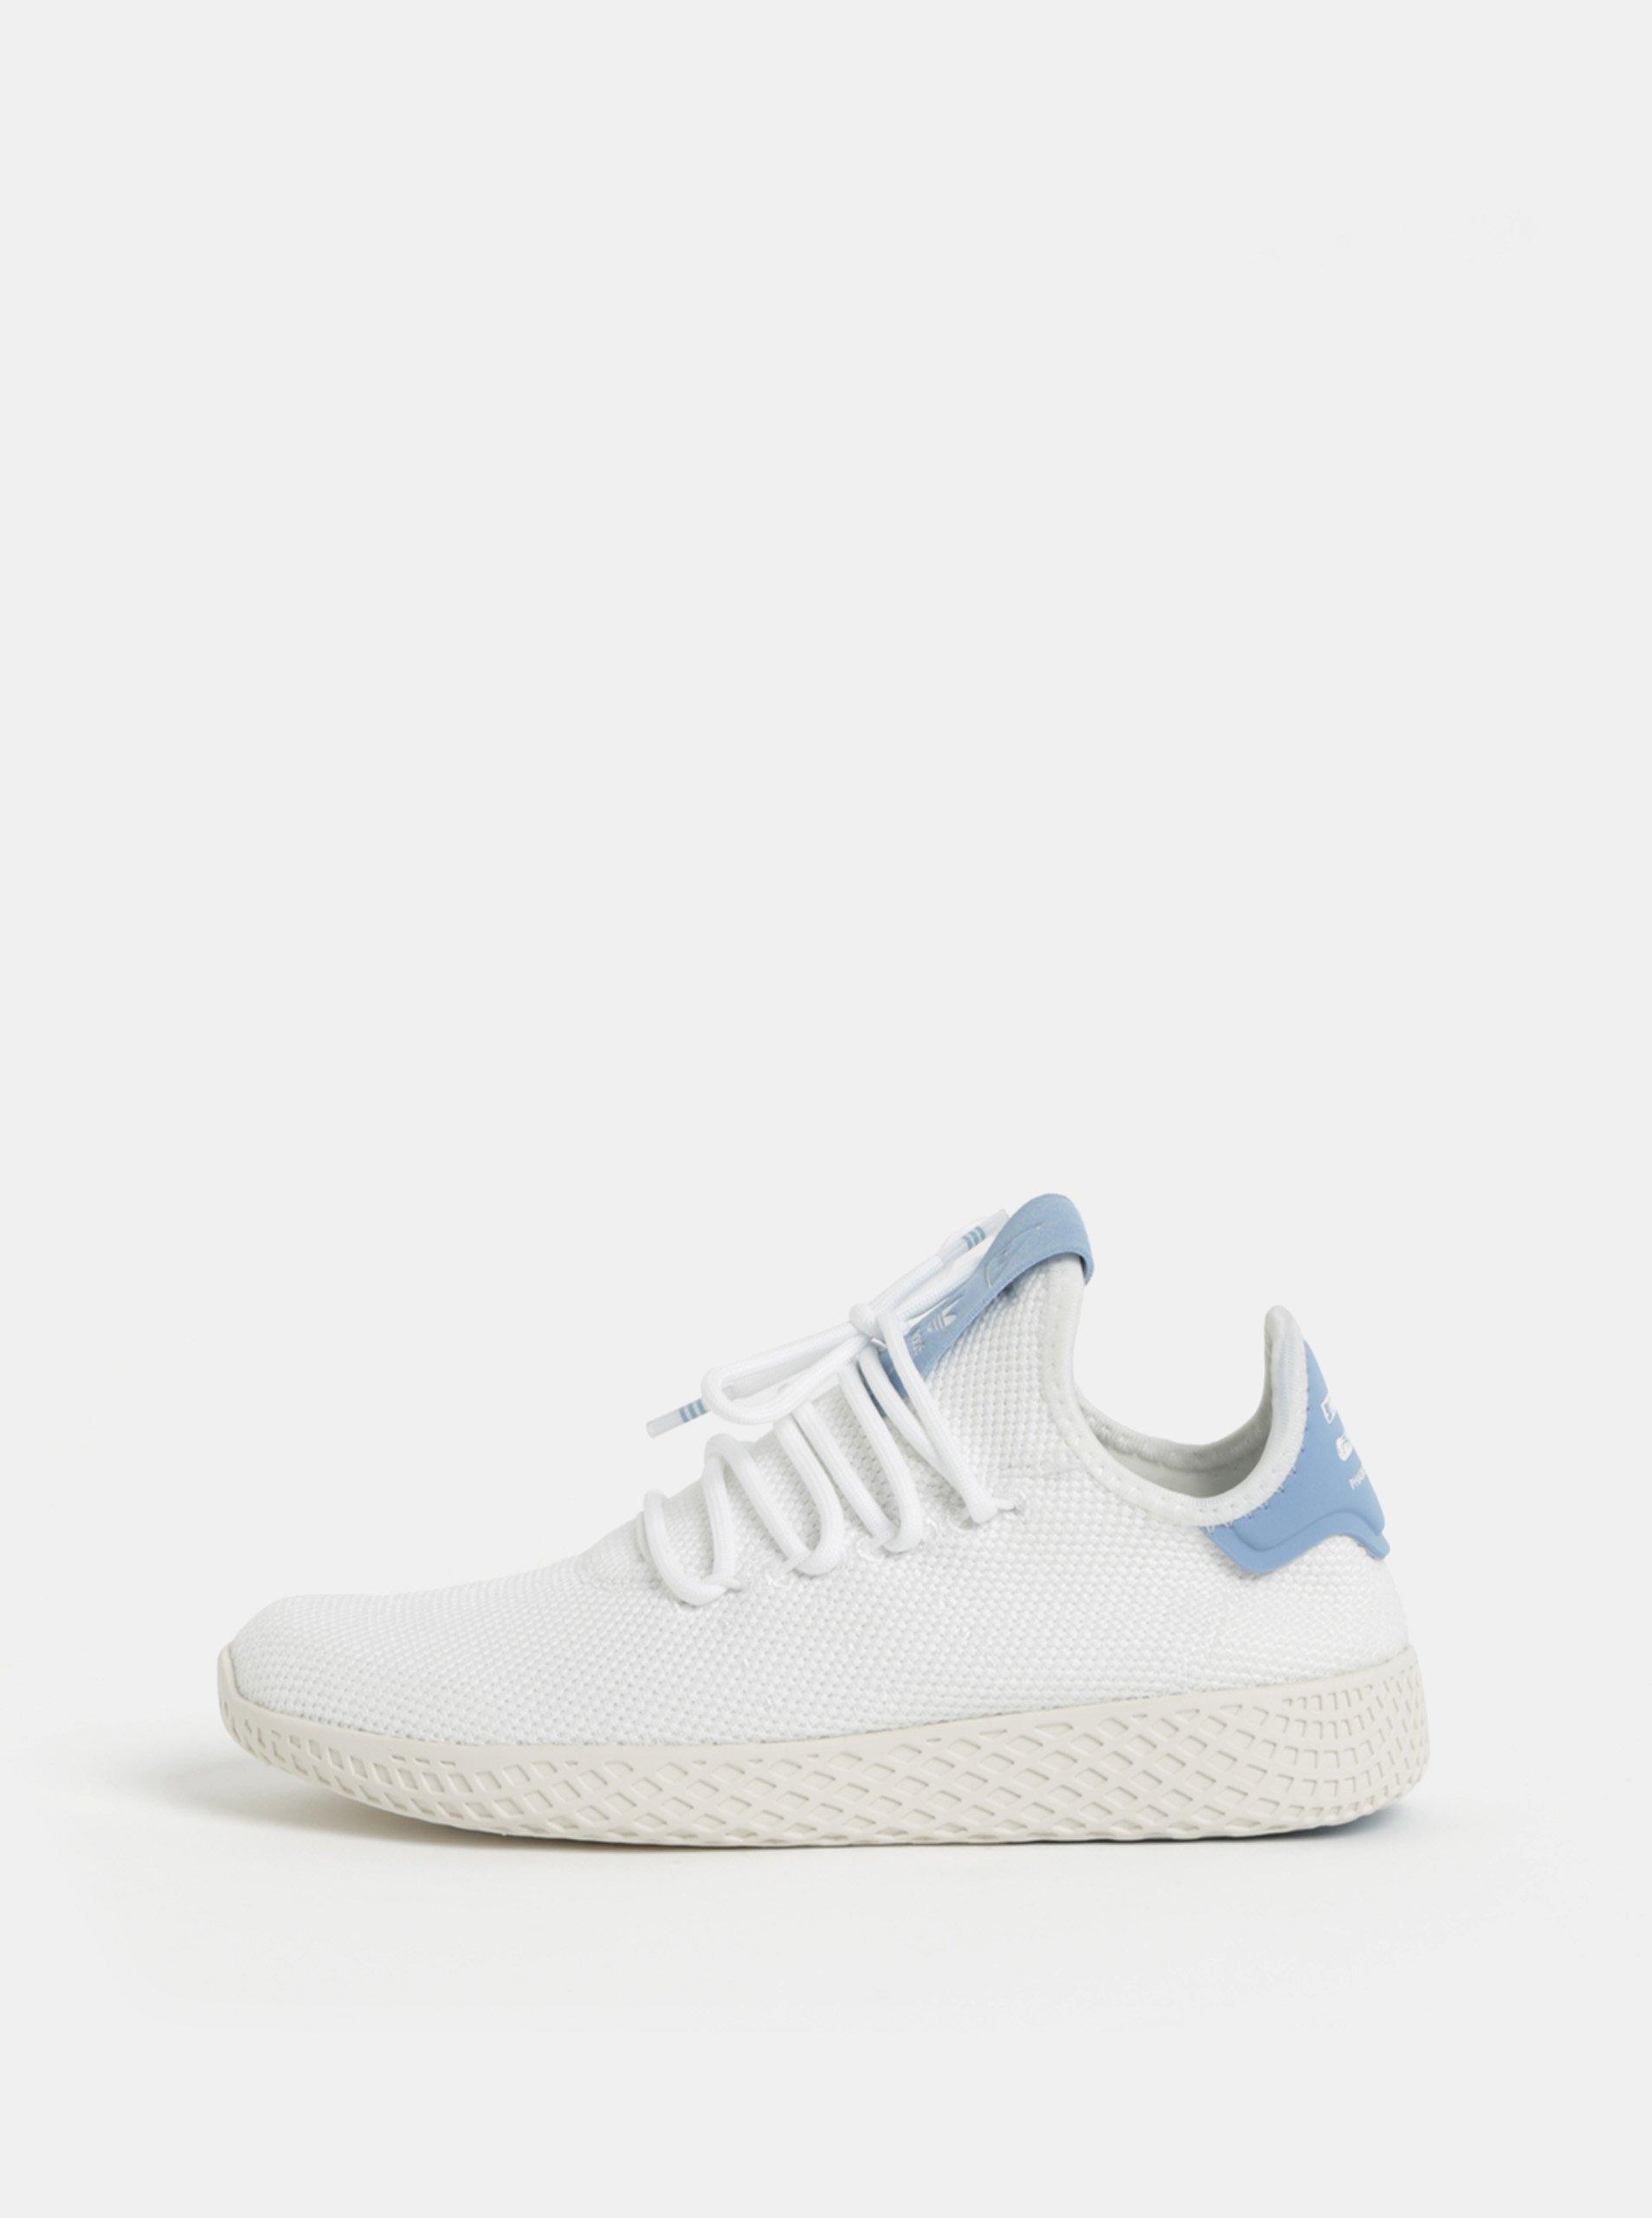 e593b25ea4d Modro-bílé dámské tenisky adidas Originals Tennis